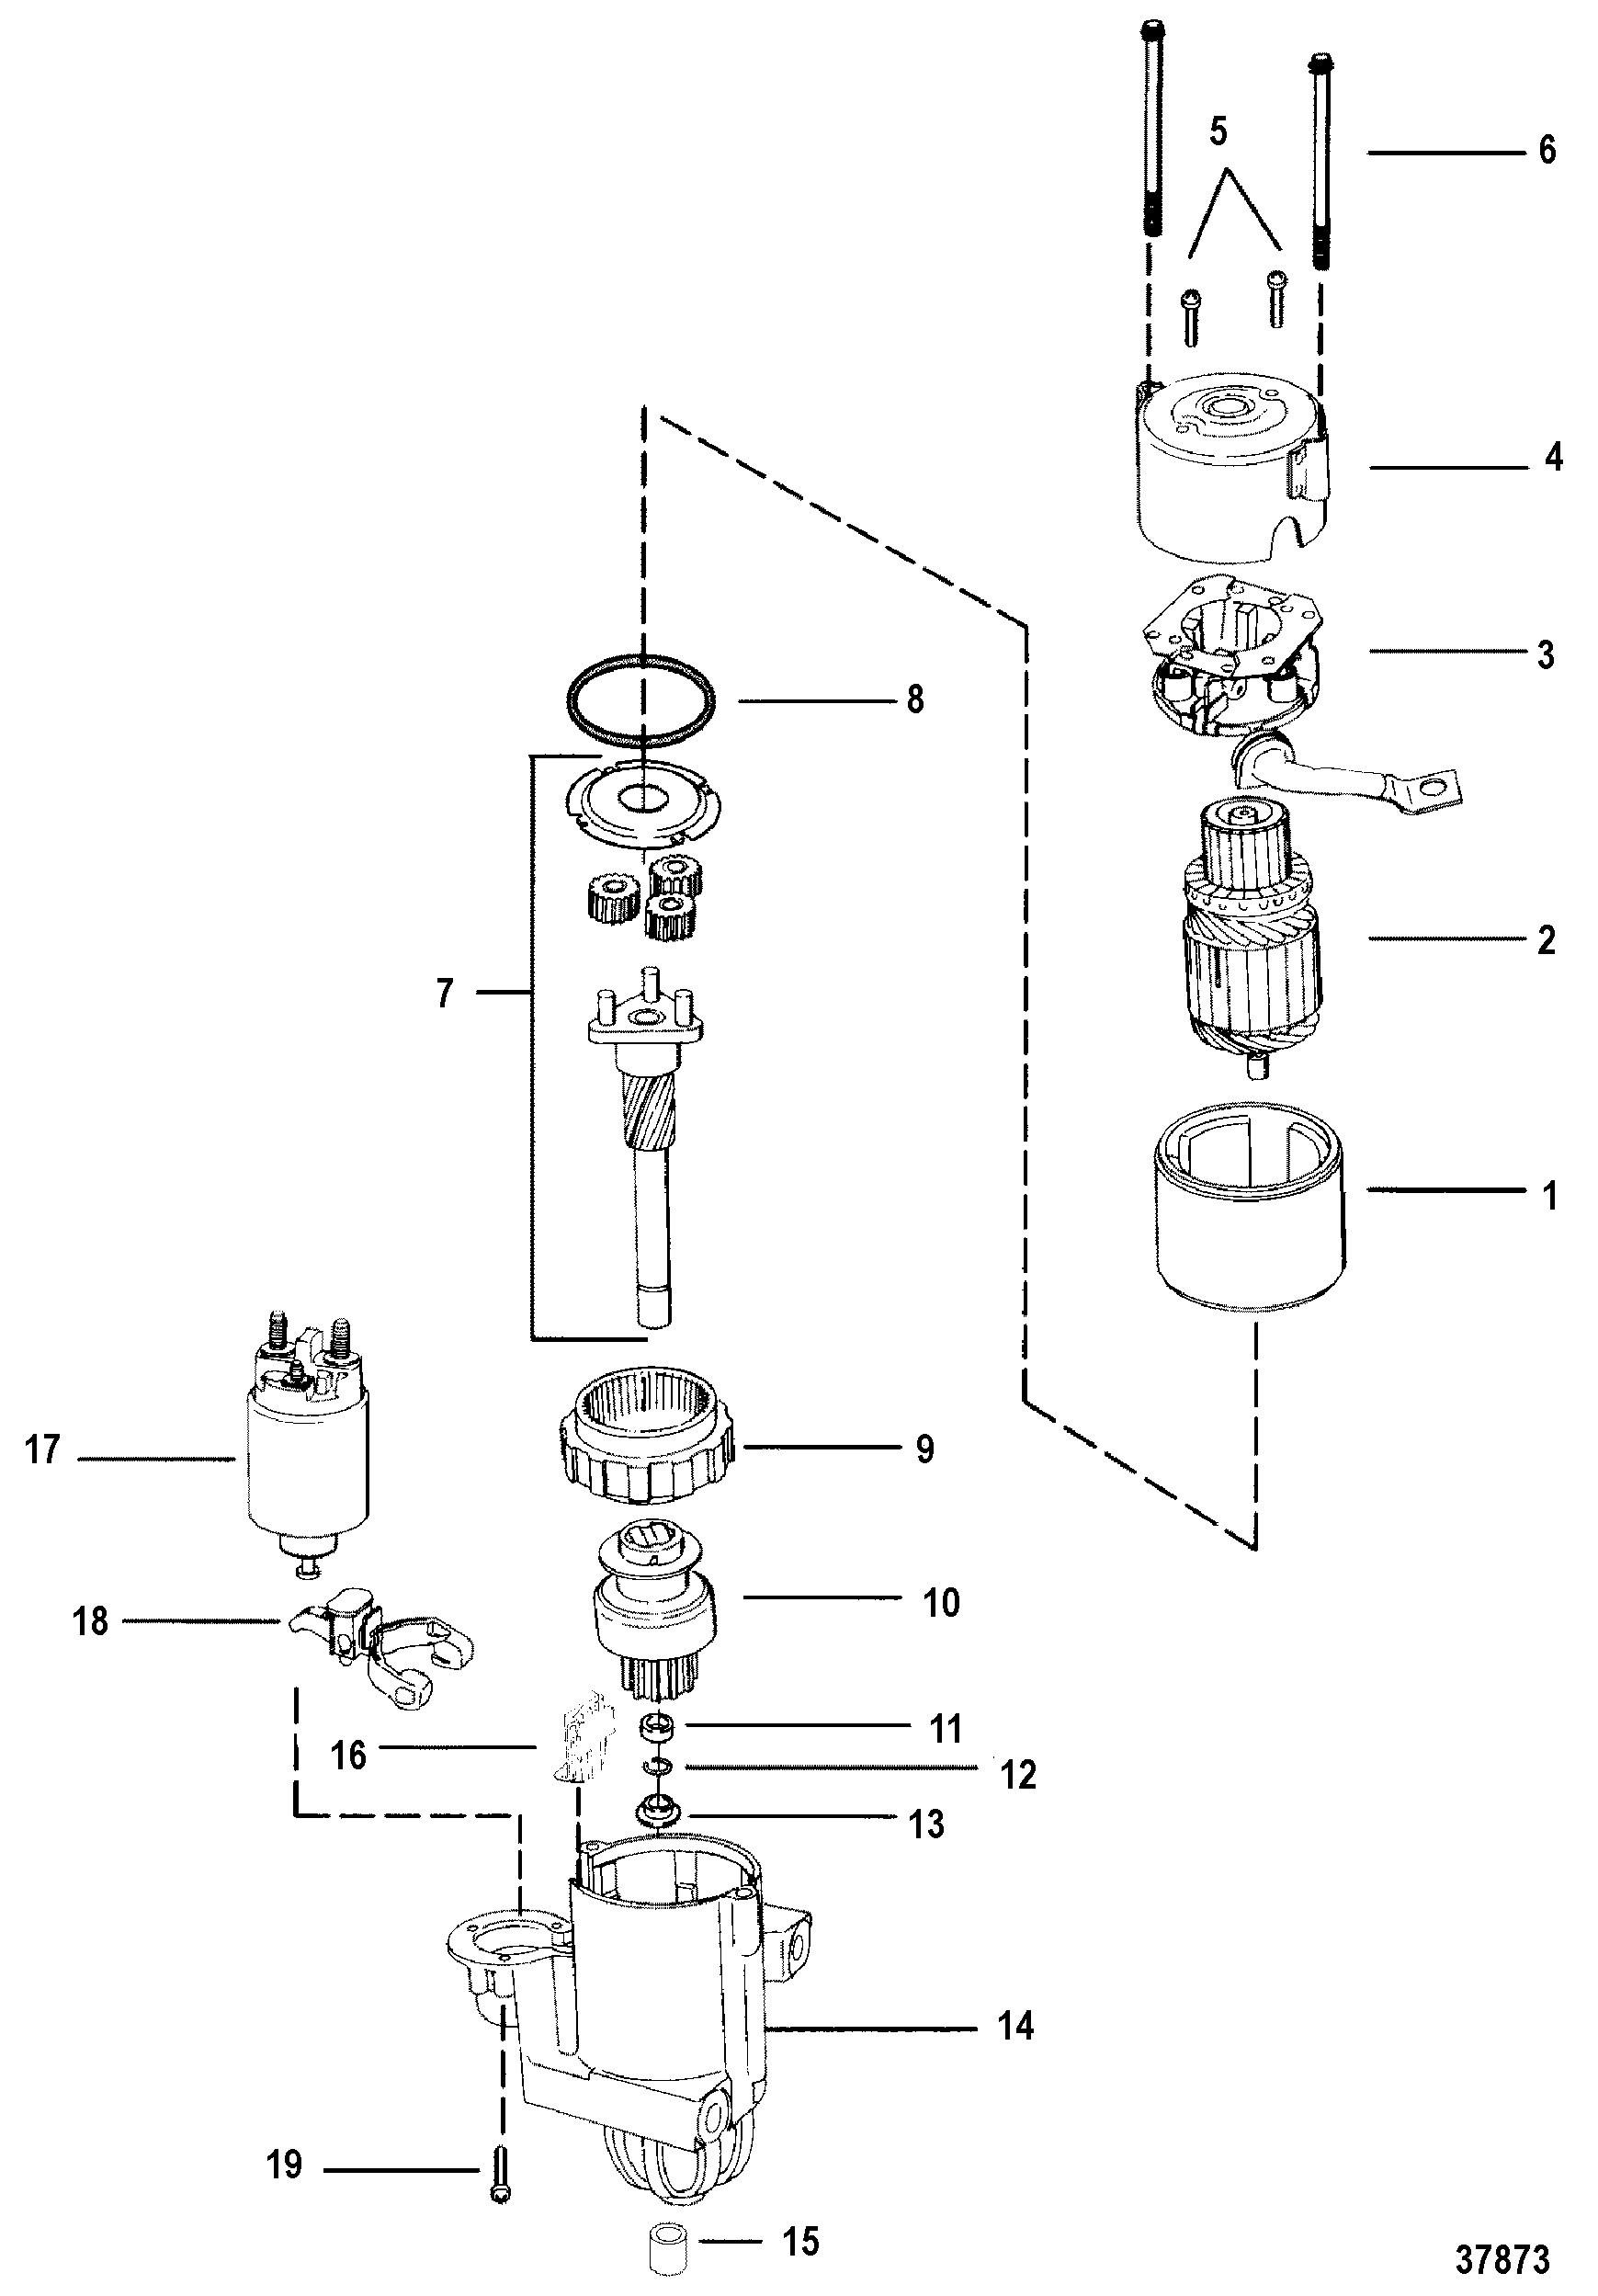 YA_3614] Apads Wiring Diagram Free DiagramVish Skat Peted Phae Mohammedshrine Librar Wiring 101